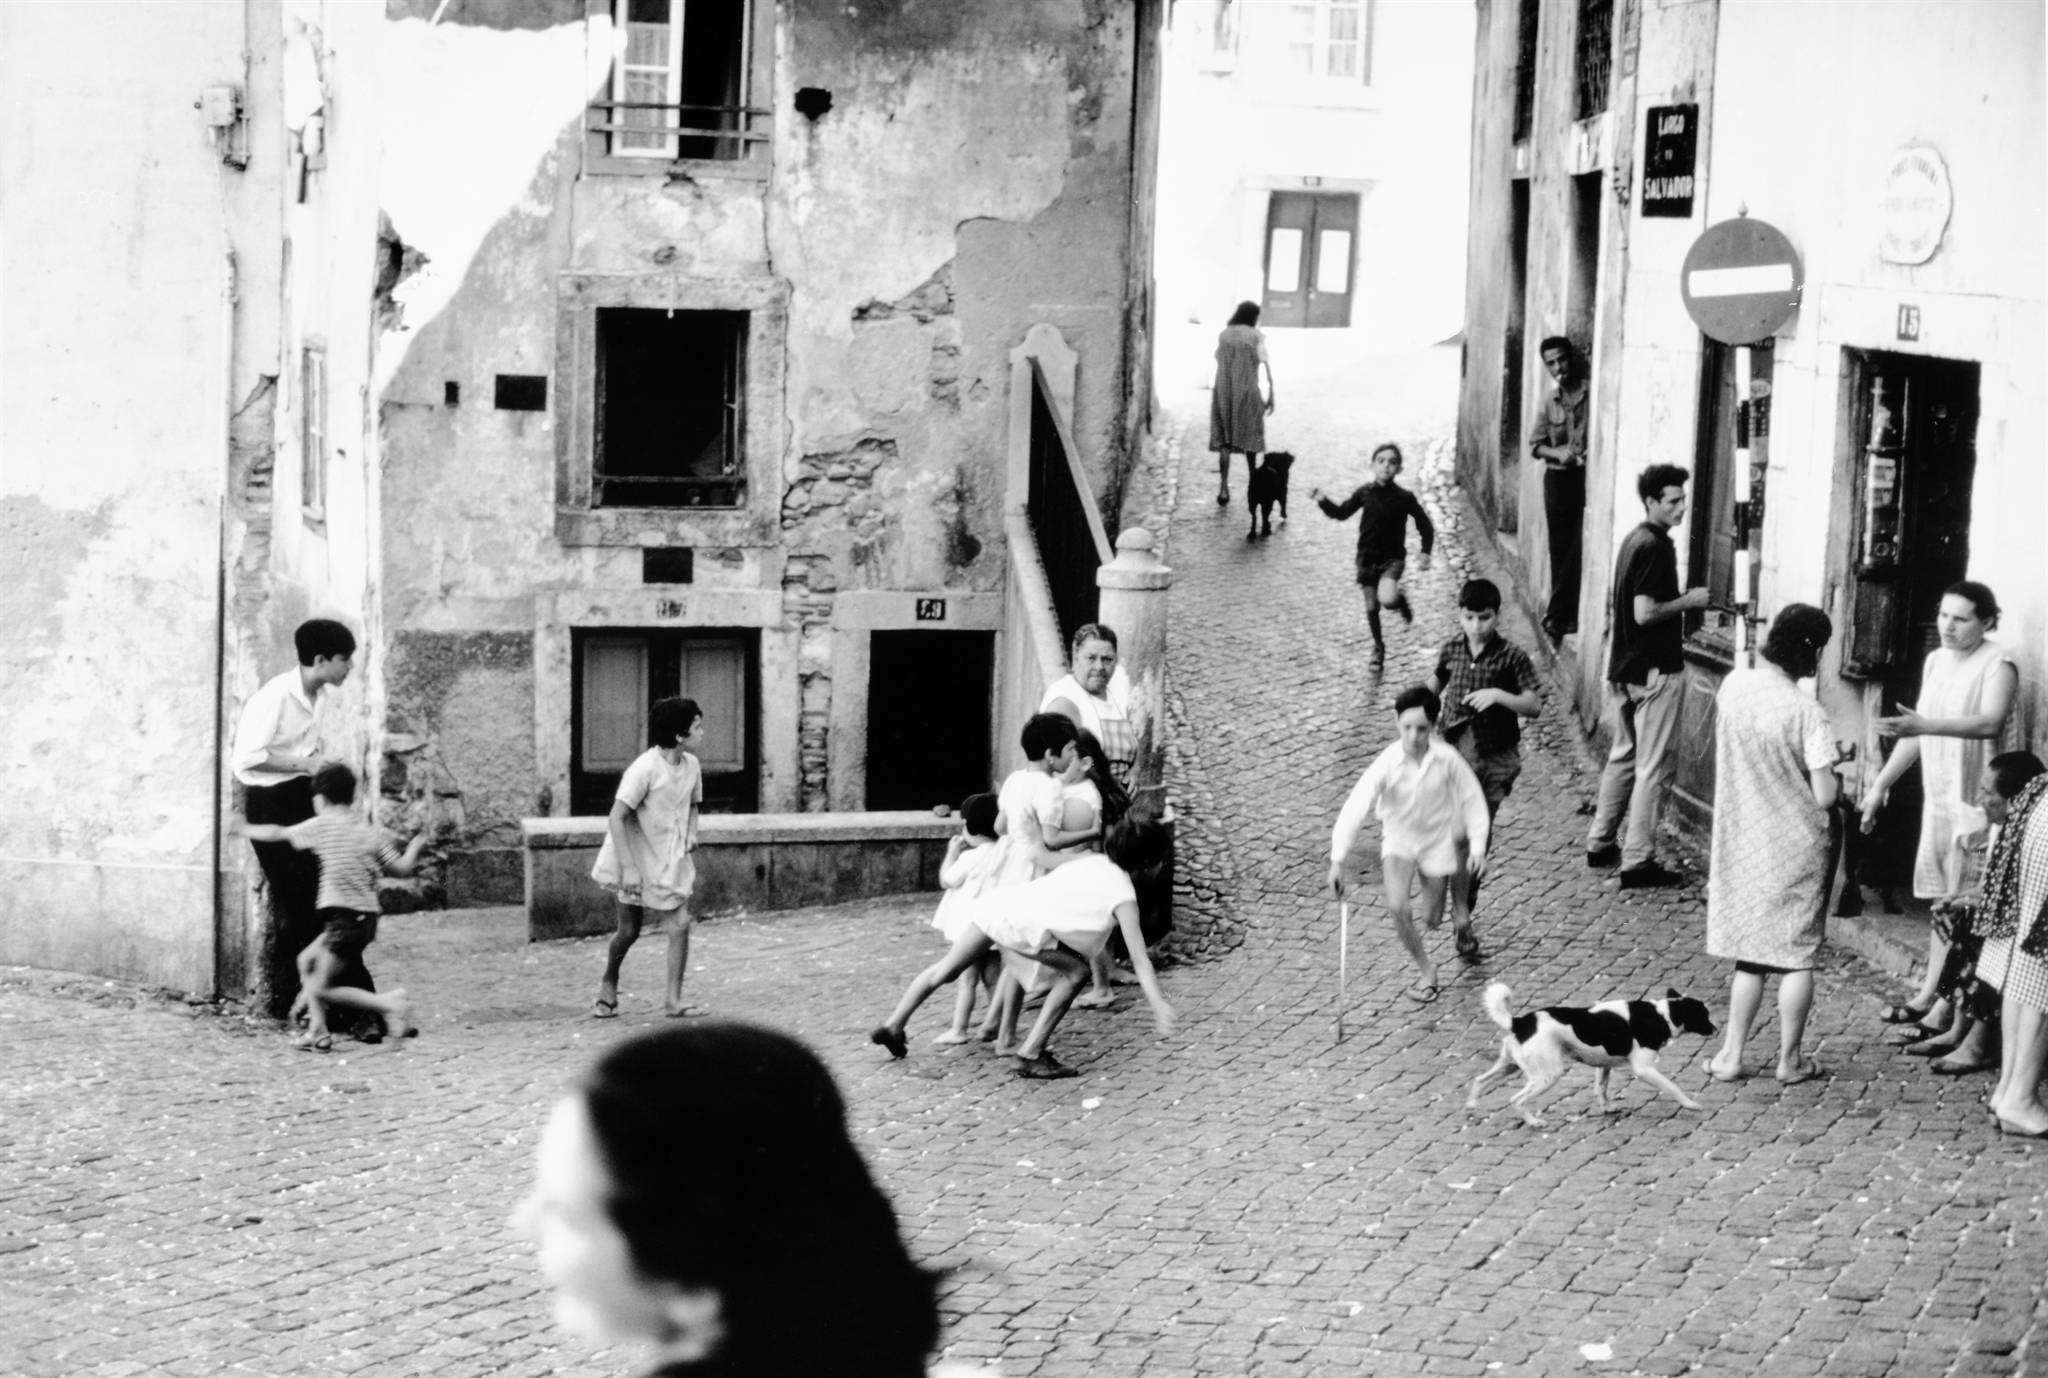 Sid Kerner, Crianças brincando na rua, 1967 | Arquivo Municipal de Lisboa, PT/AMLSB/SID/000081